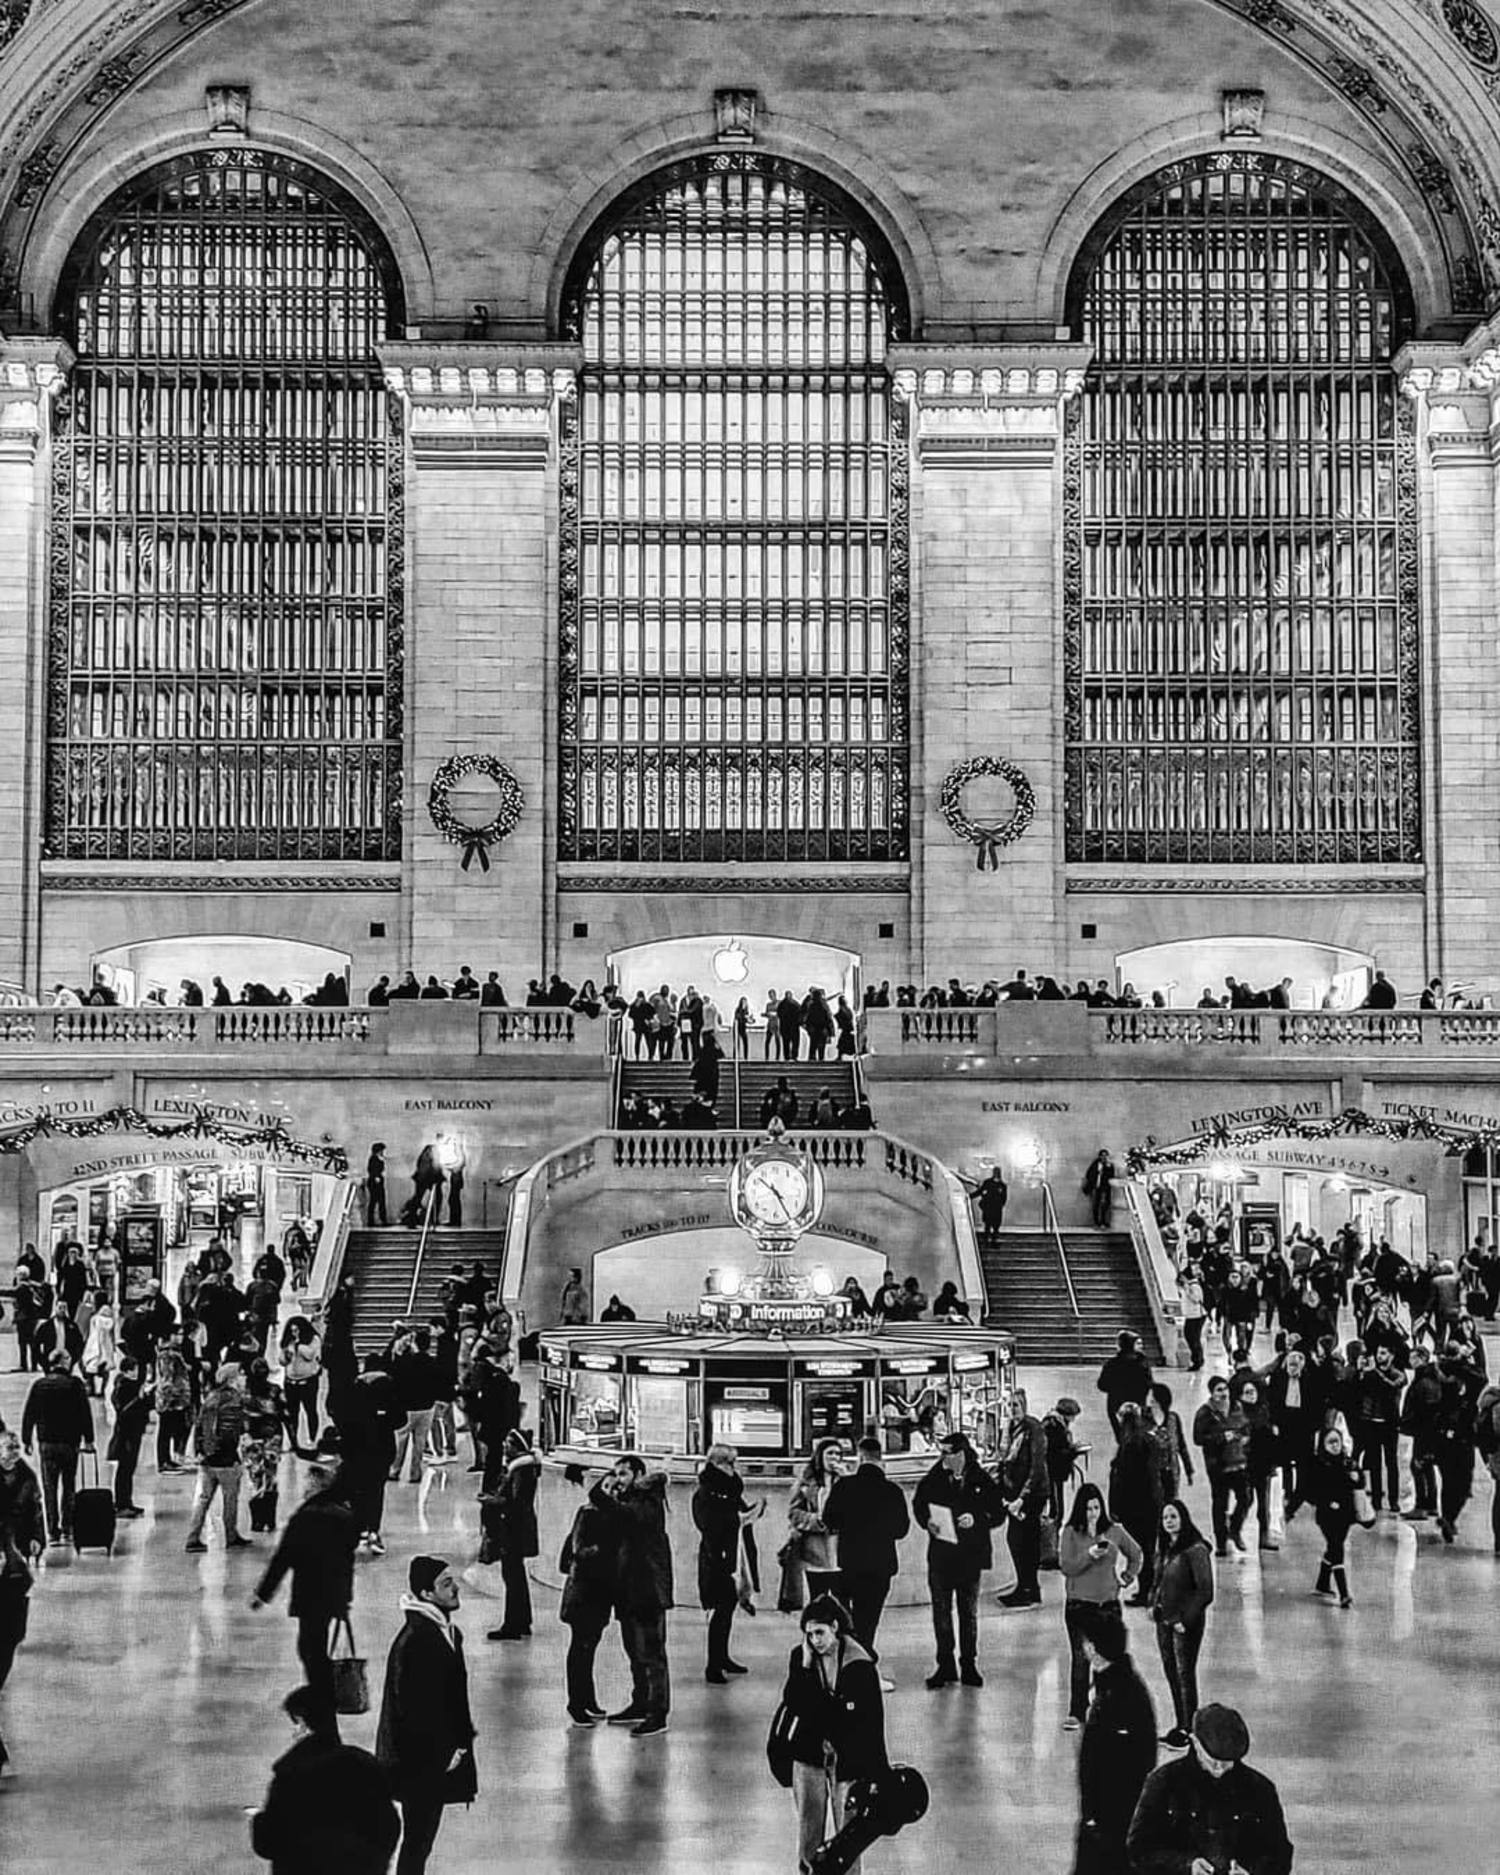 Grand Central Terminal, Midtown, Manhattan. Photo via @beacon_transplant #viewingnyc #nyc #newyork #newyorkcity #grandcentral